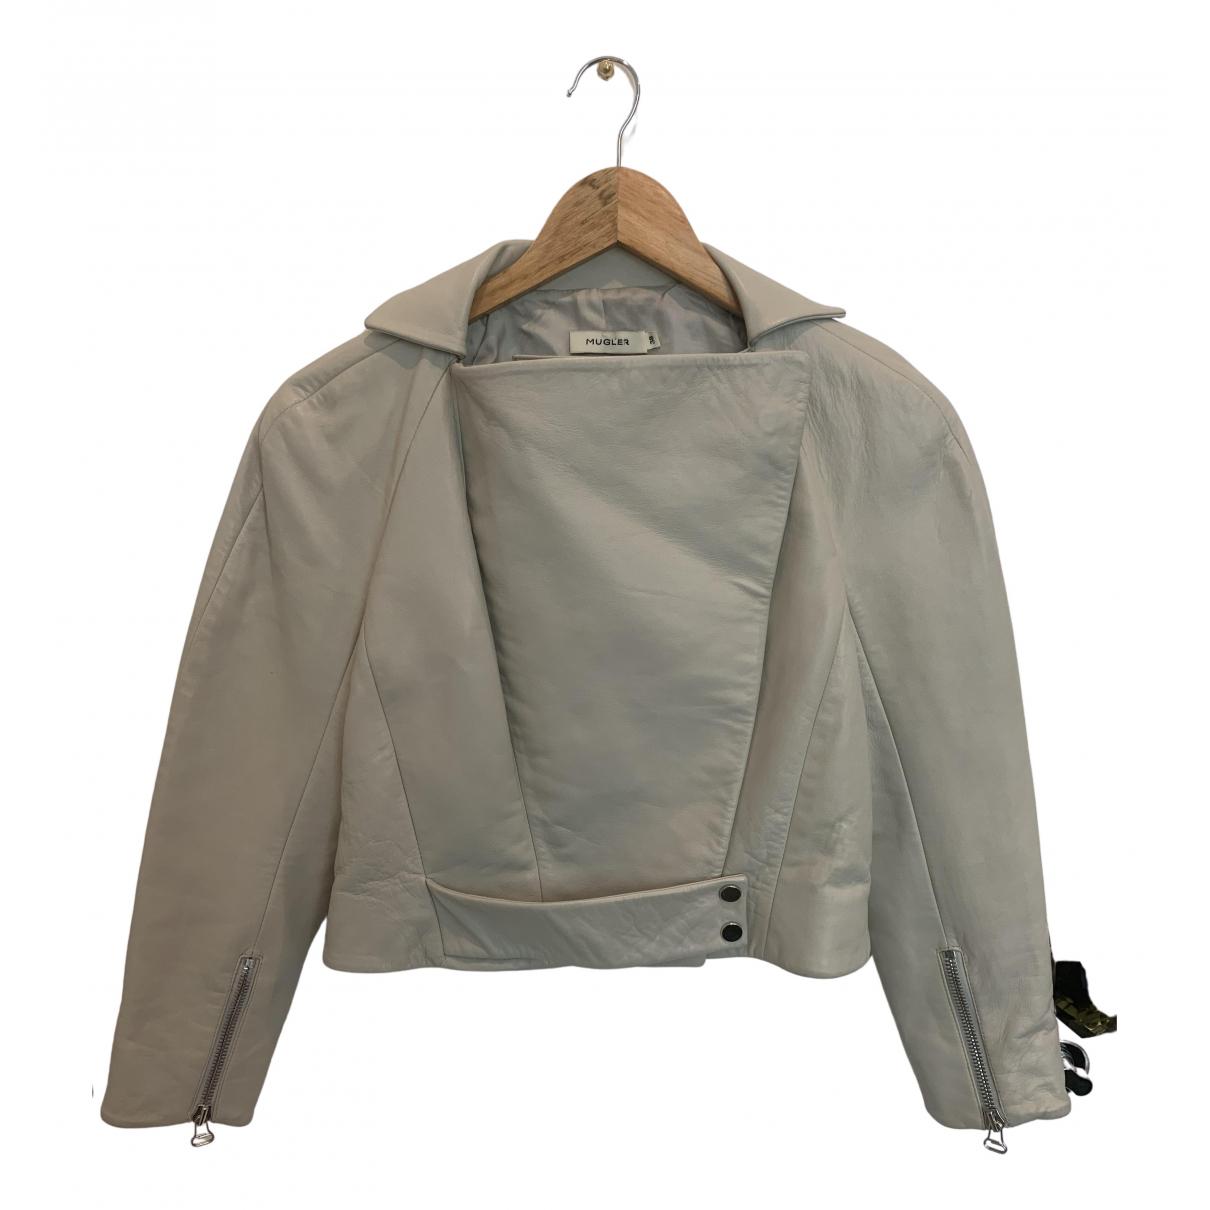 Mugler N White Leather Leather jacket for Women 38 FR